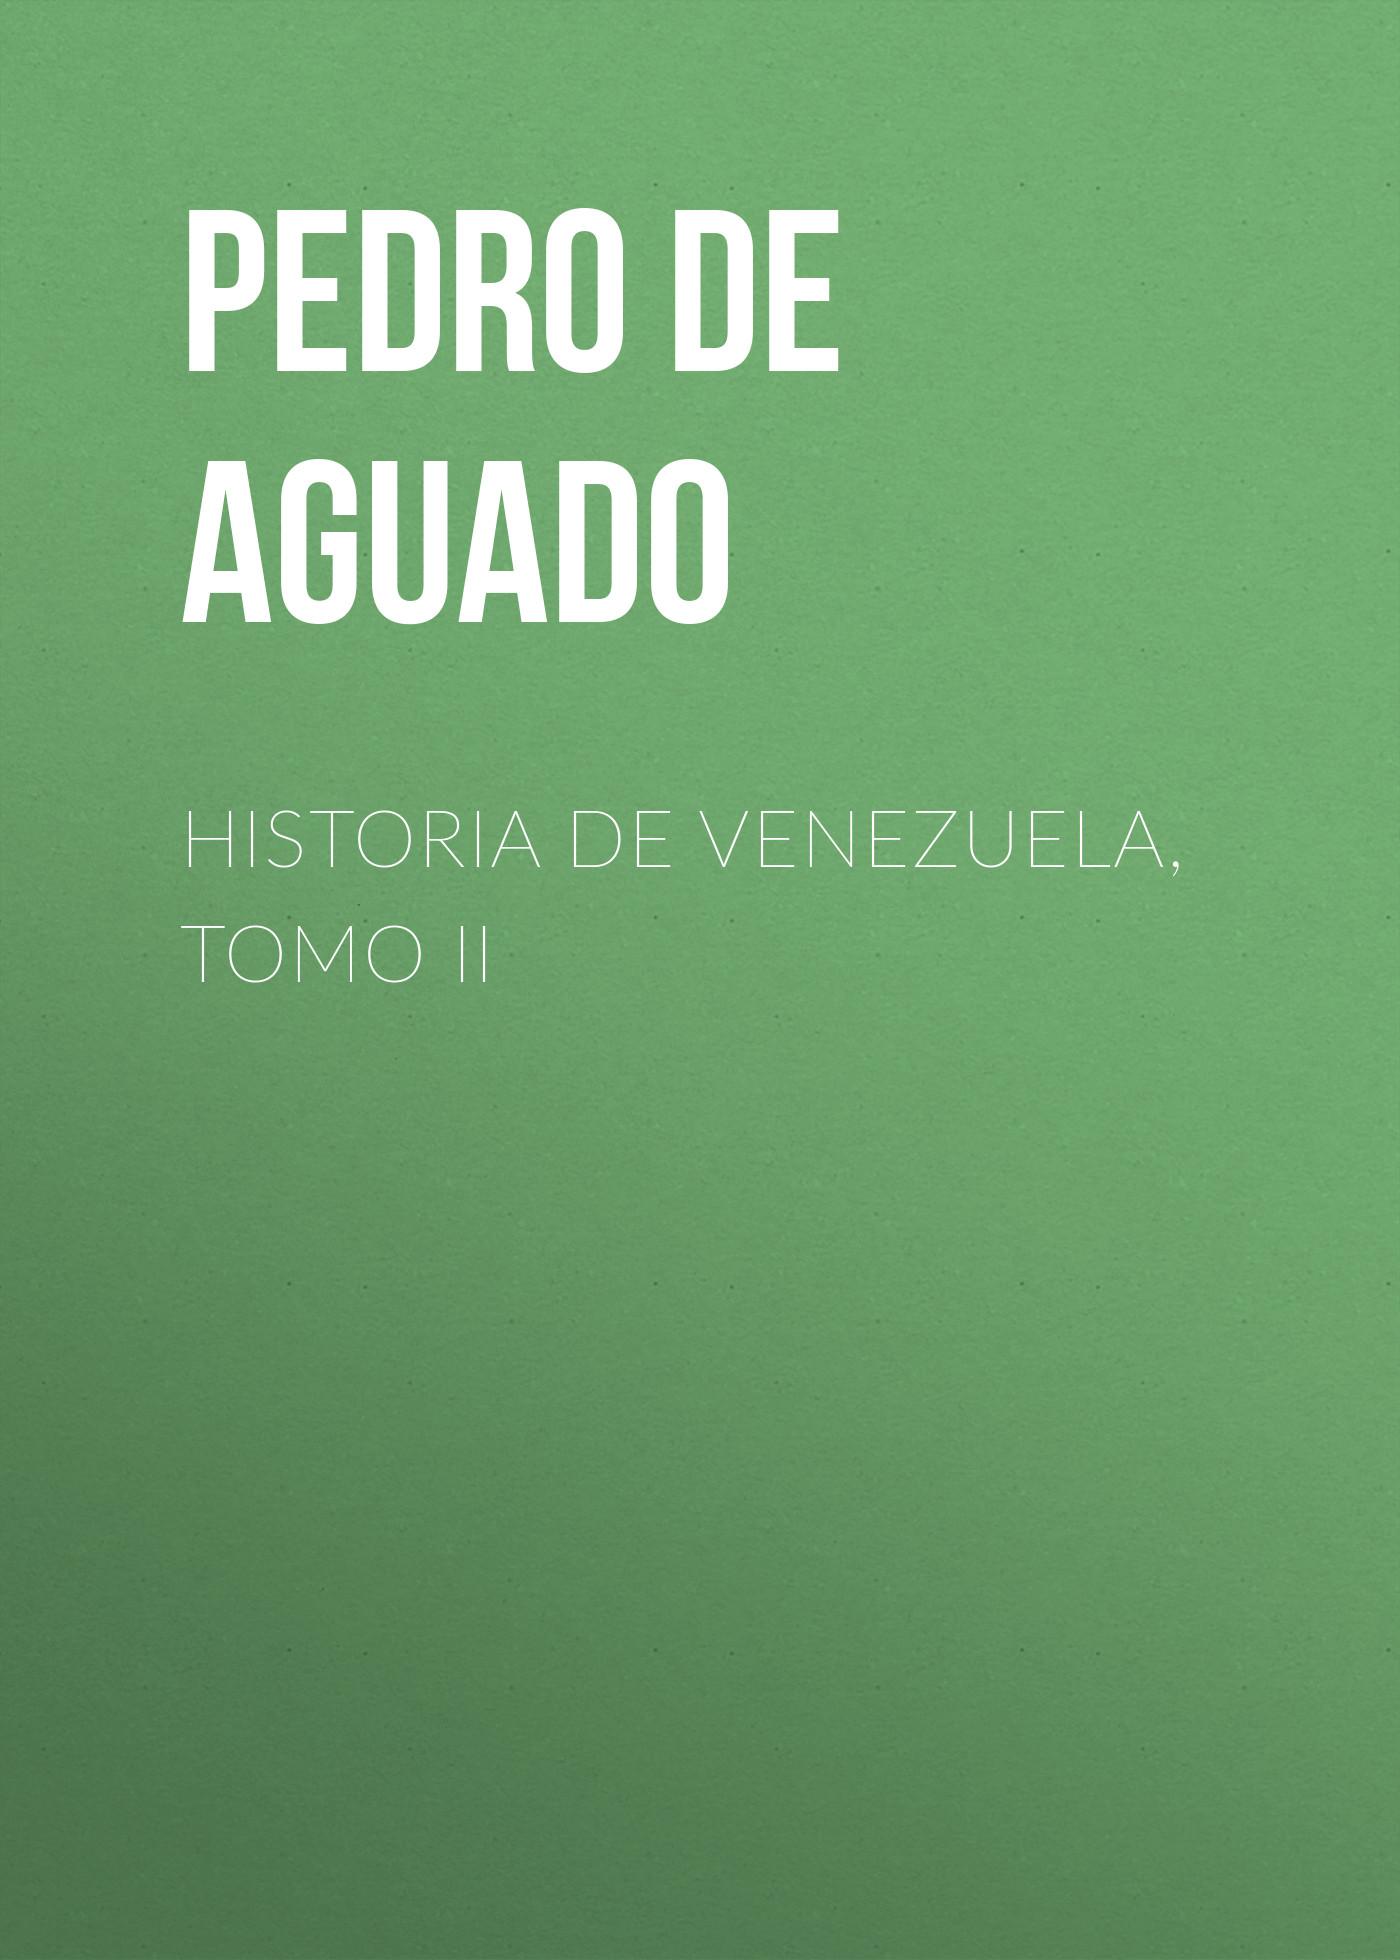 Pedro de Aguado Historia de Venezuela, Tomo II pedro de aguado historia de venezuela tomo ii